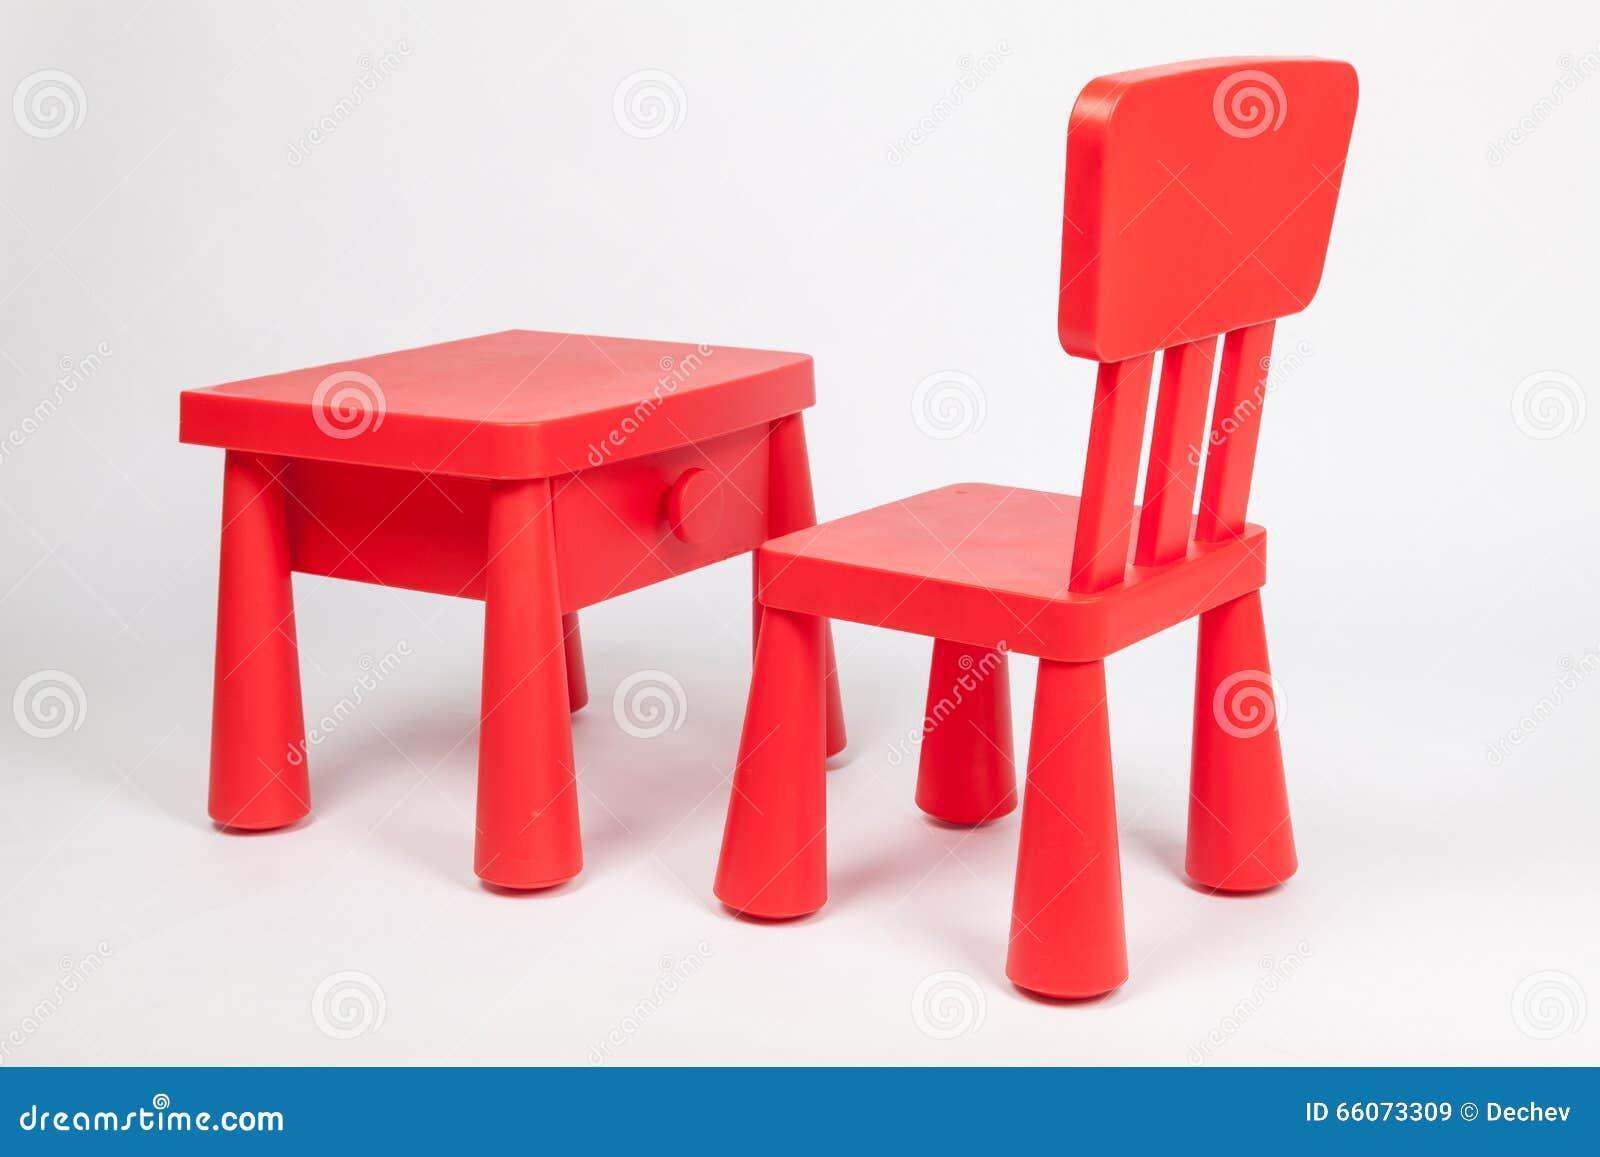 Kindergarten classroom table - Red Chair And Red Table For Children In Kindergarten Preschool Classroom Stock Photo